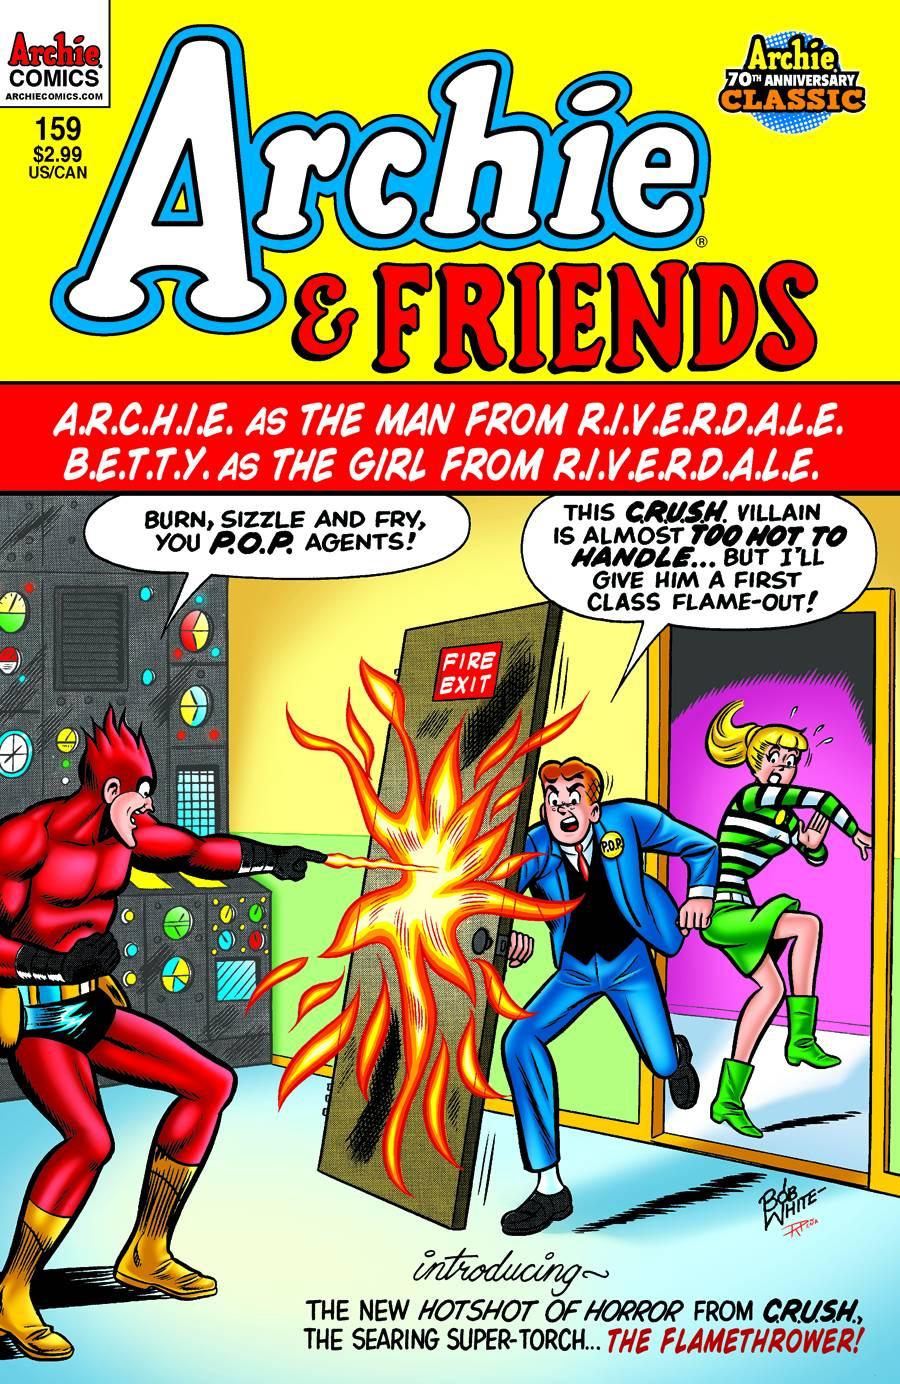 westfield comics blog 187 2011 187 december 187 21